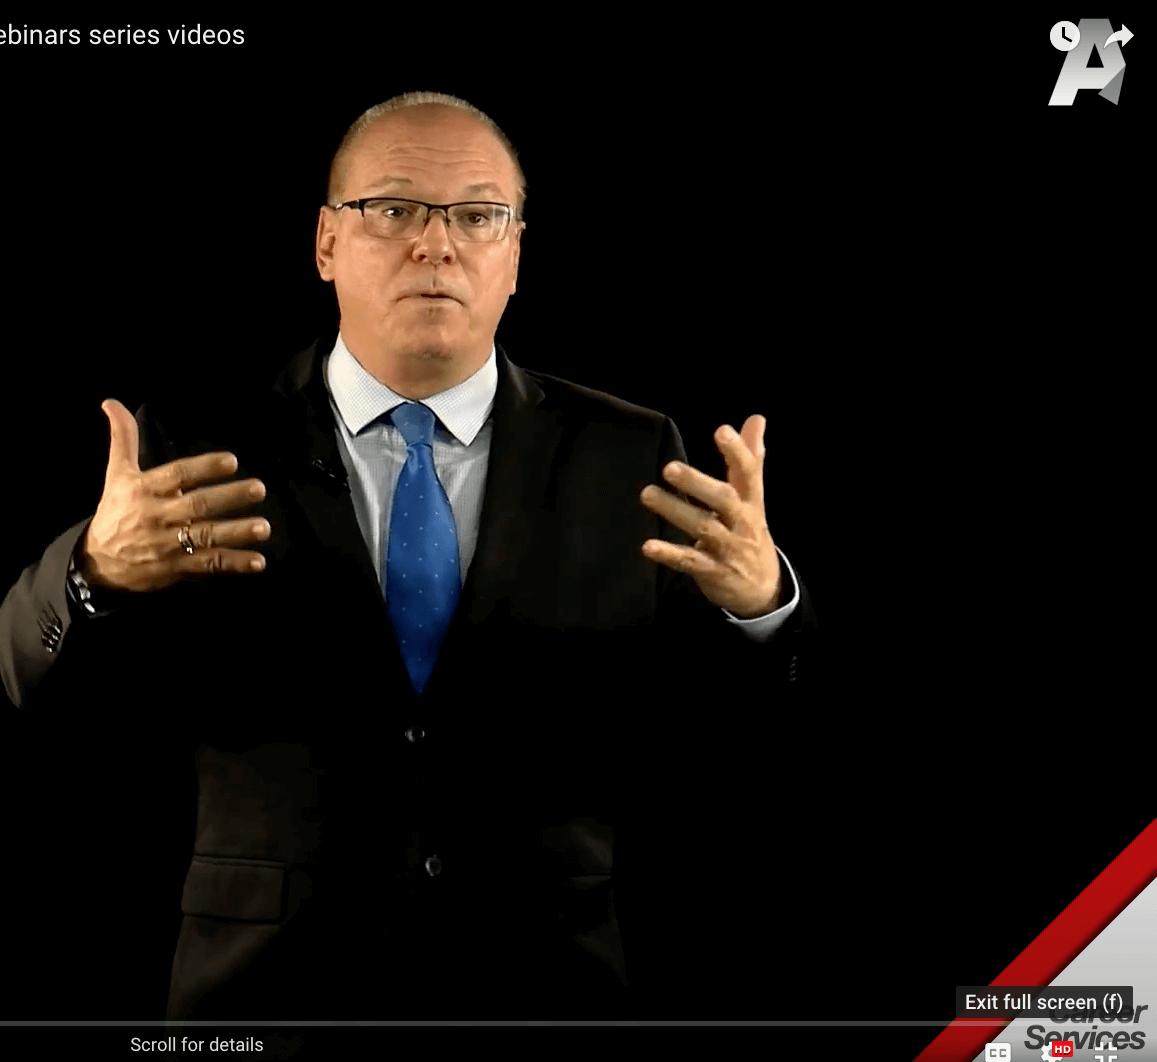 Negociation Skills by Alex Lima An AU Career Services webinars series videos